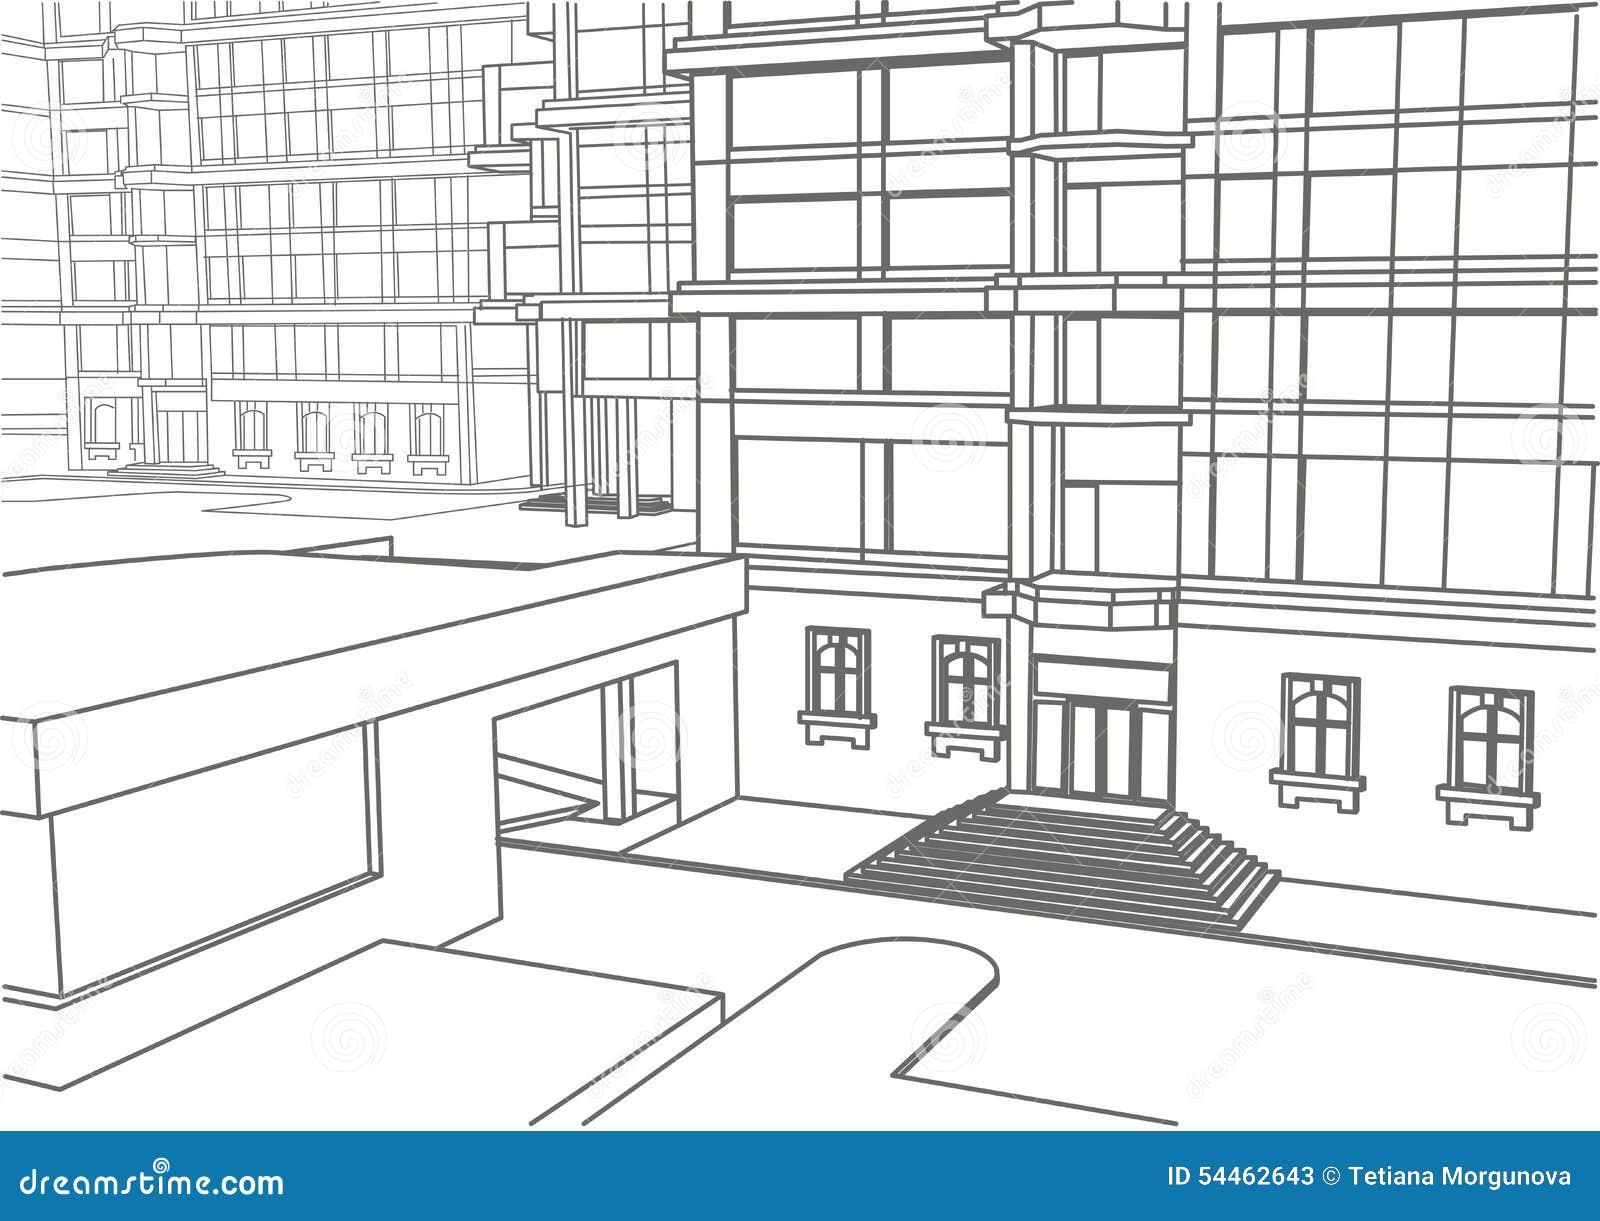 architektonische lineare skizze des geb udes in wenigen. Black Bedroom Furniture Sets. Home Design Ideas